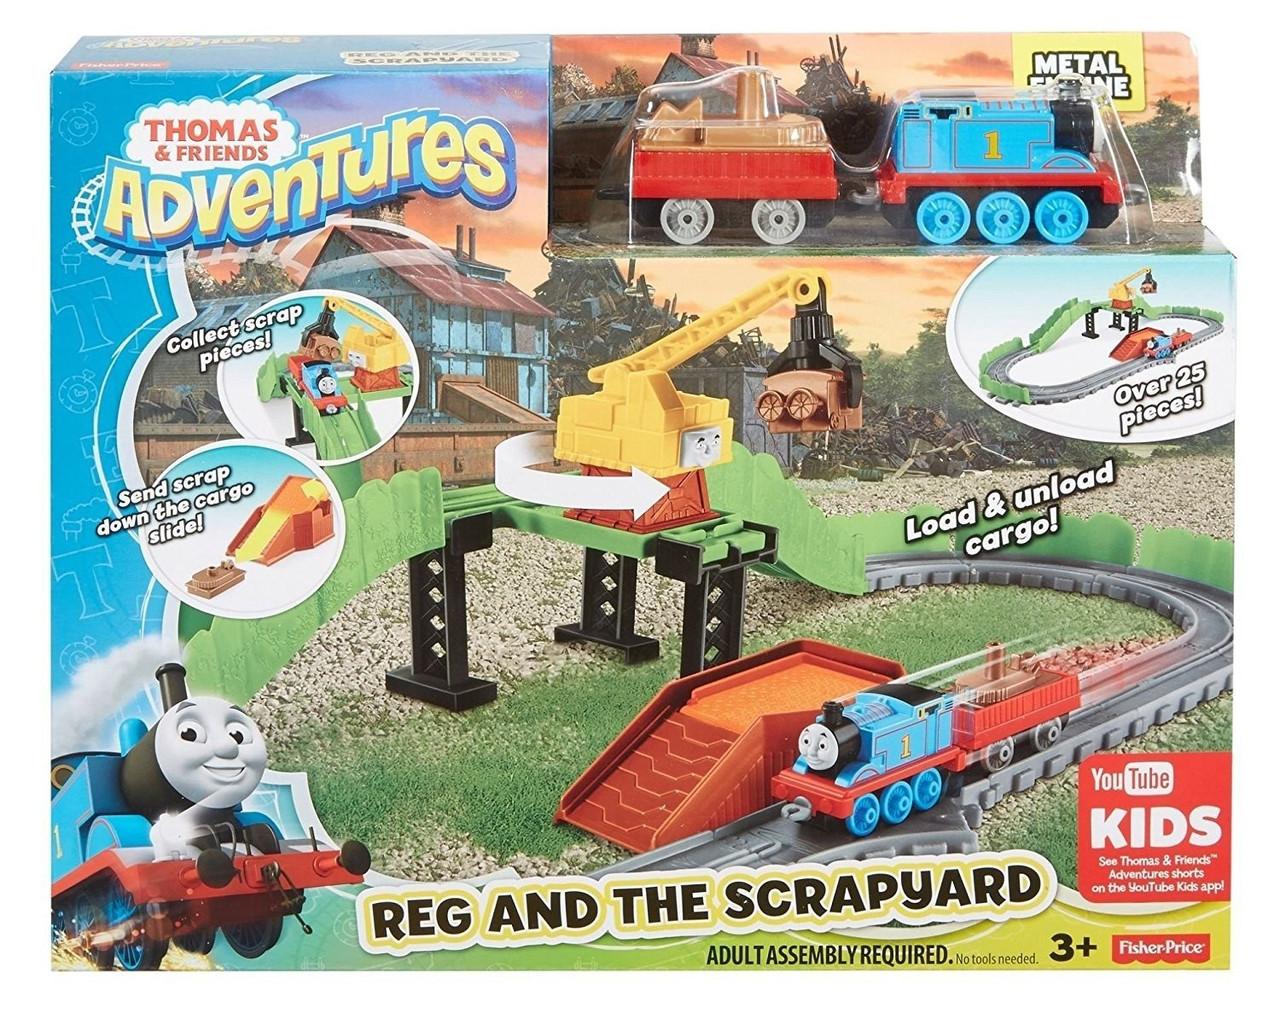 Thomas & Friends Adventures Reg At The Scrapyard Set